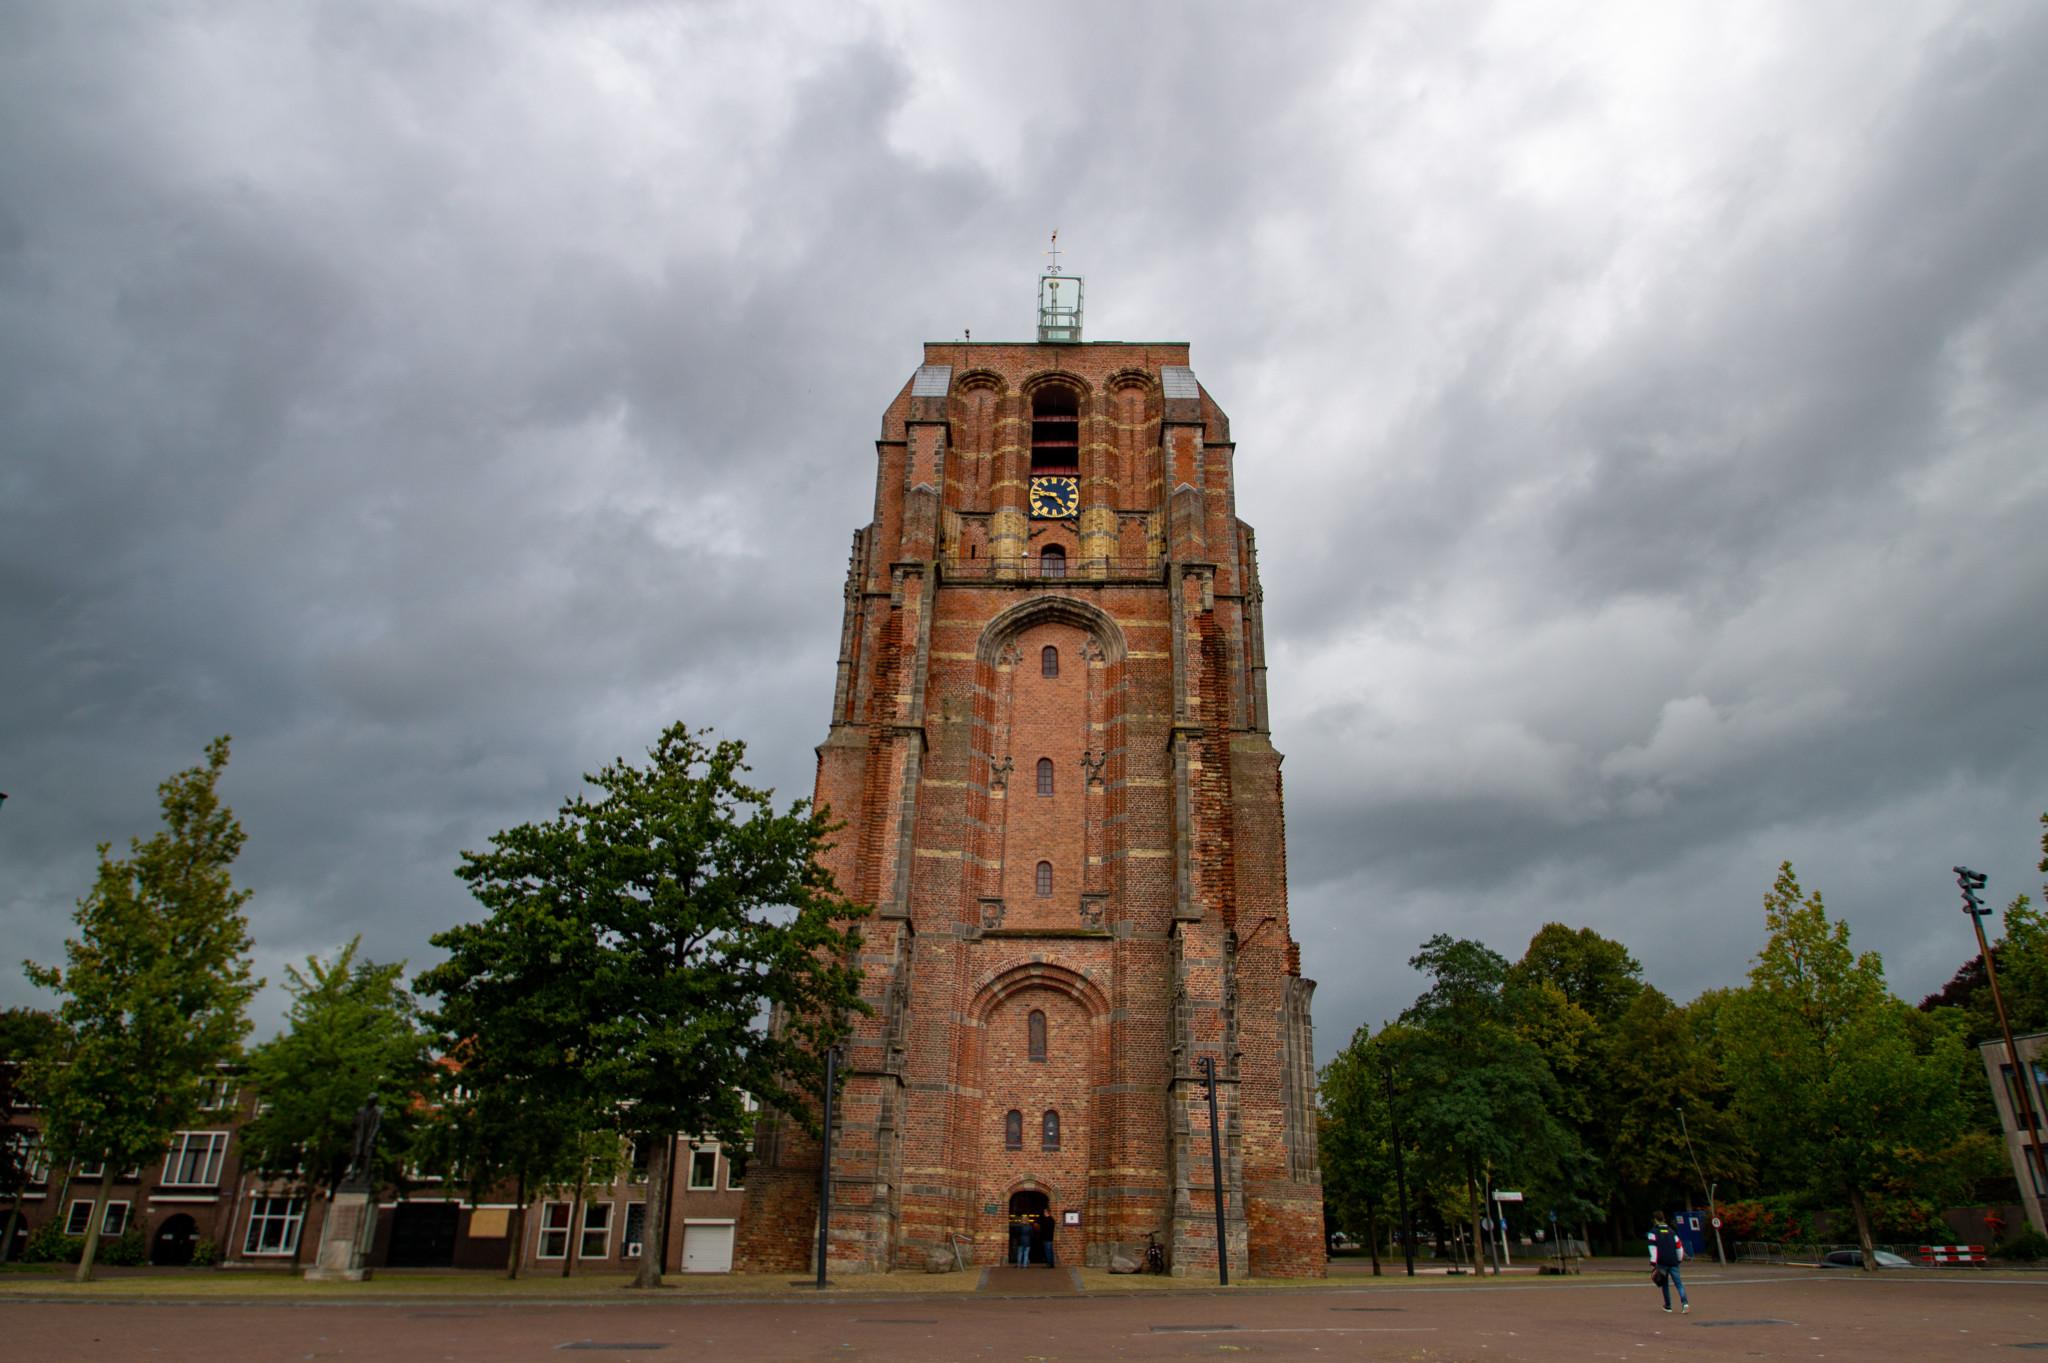 Schiefer Turm Oldehove in Leeuwarden